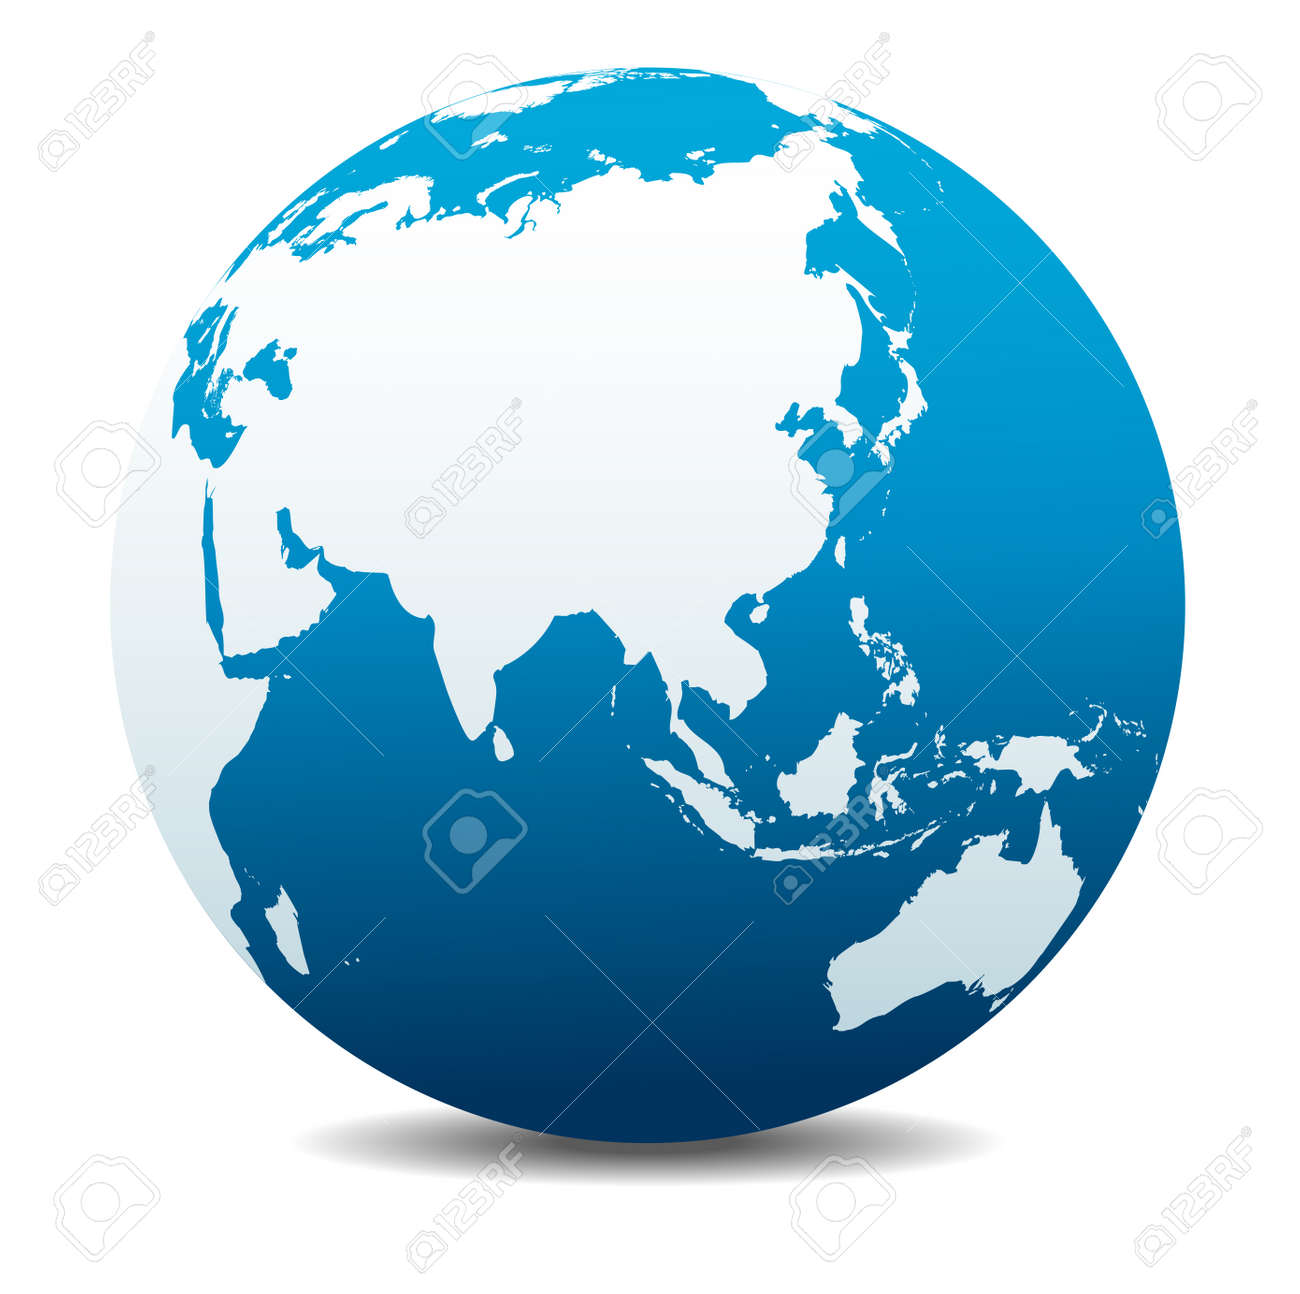 China and Asia, Global World - 48970107